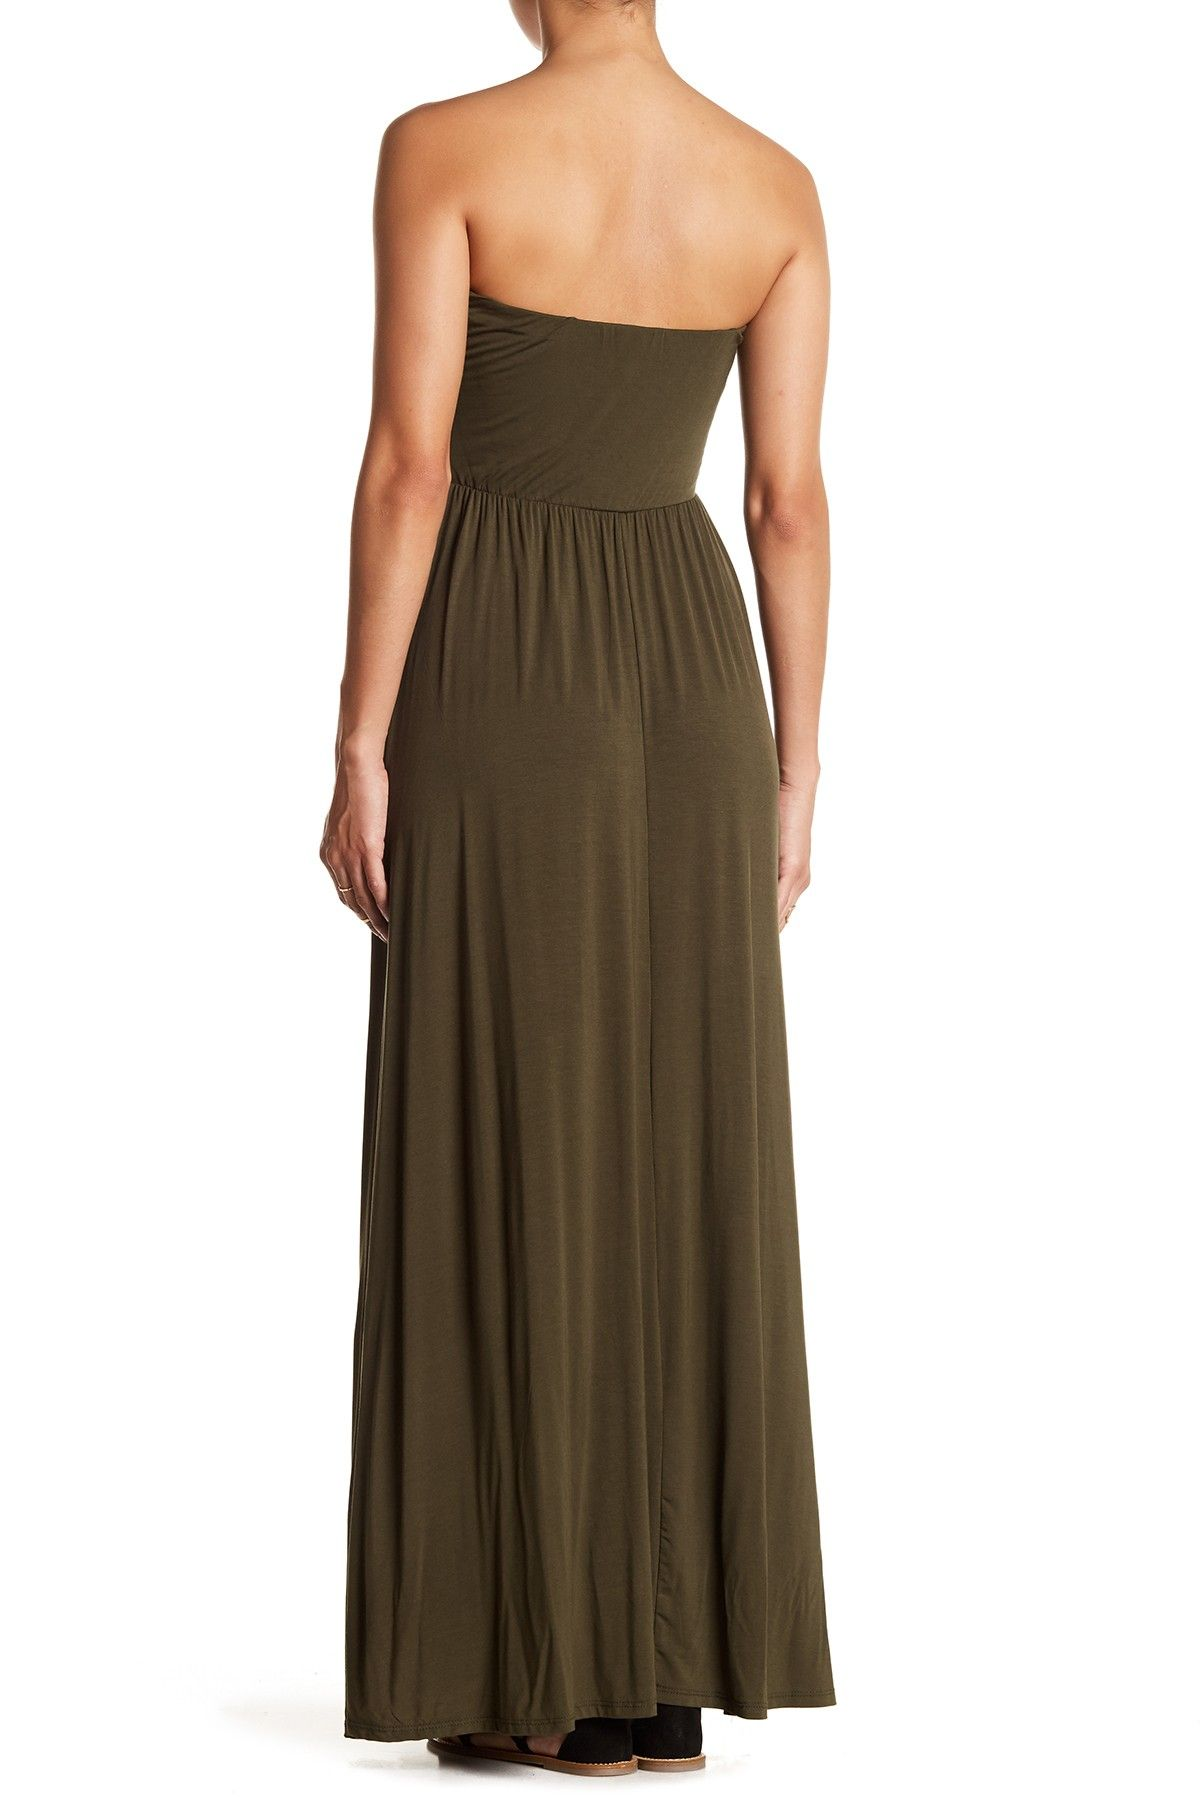 West Kei Strapless Maxi Dress Hautelook Strapless Maxi Dress Nordstrom Dresses Dresses [ 1800 x 1200 Pixel ]